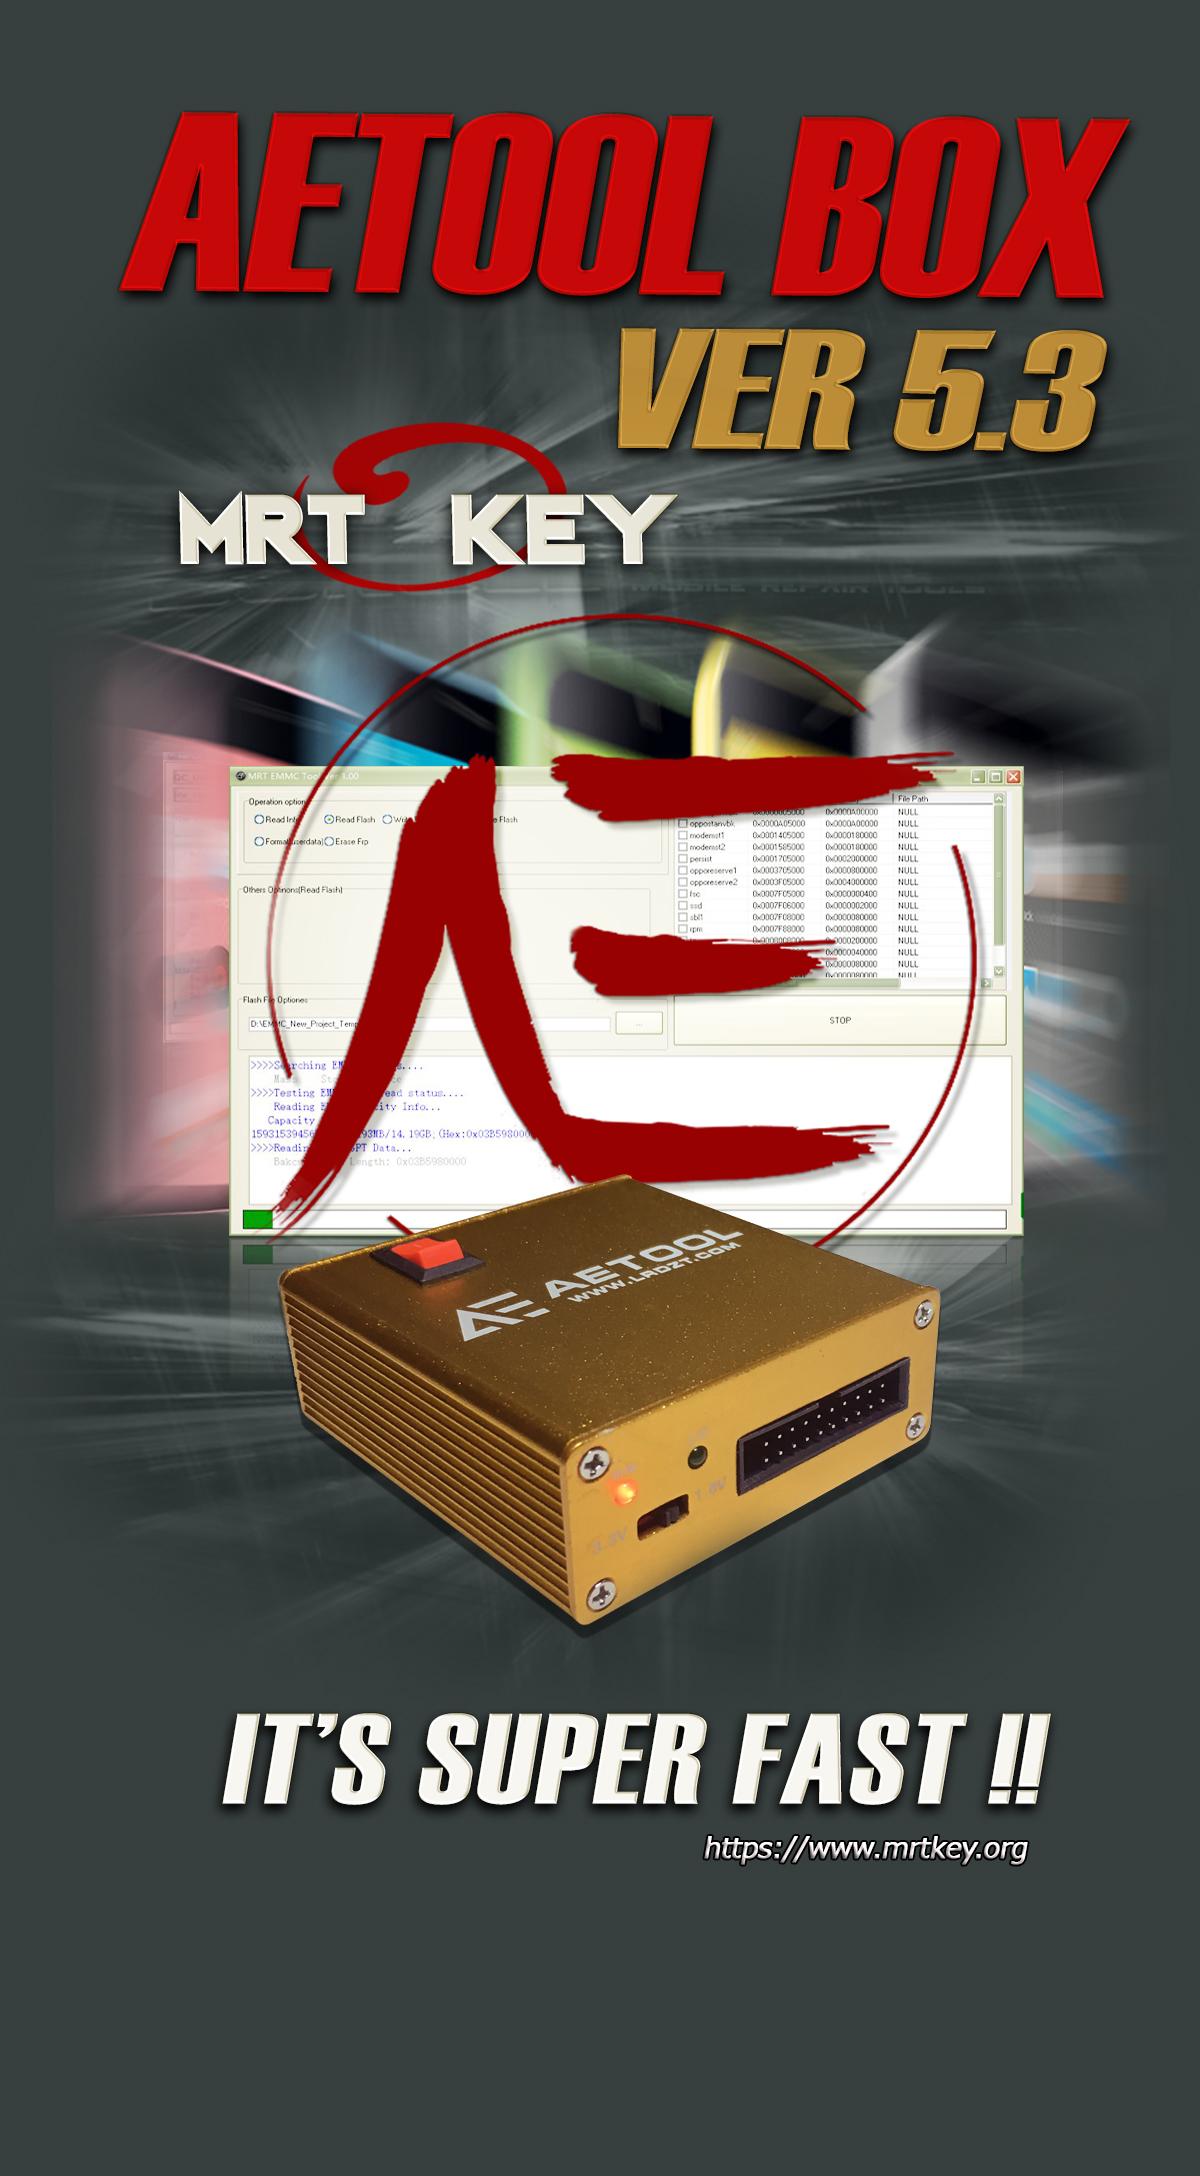 AETool BOX Ver 5.3 Update Released (9/1/2020)